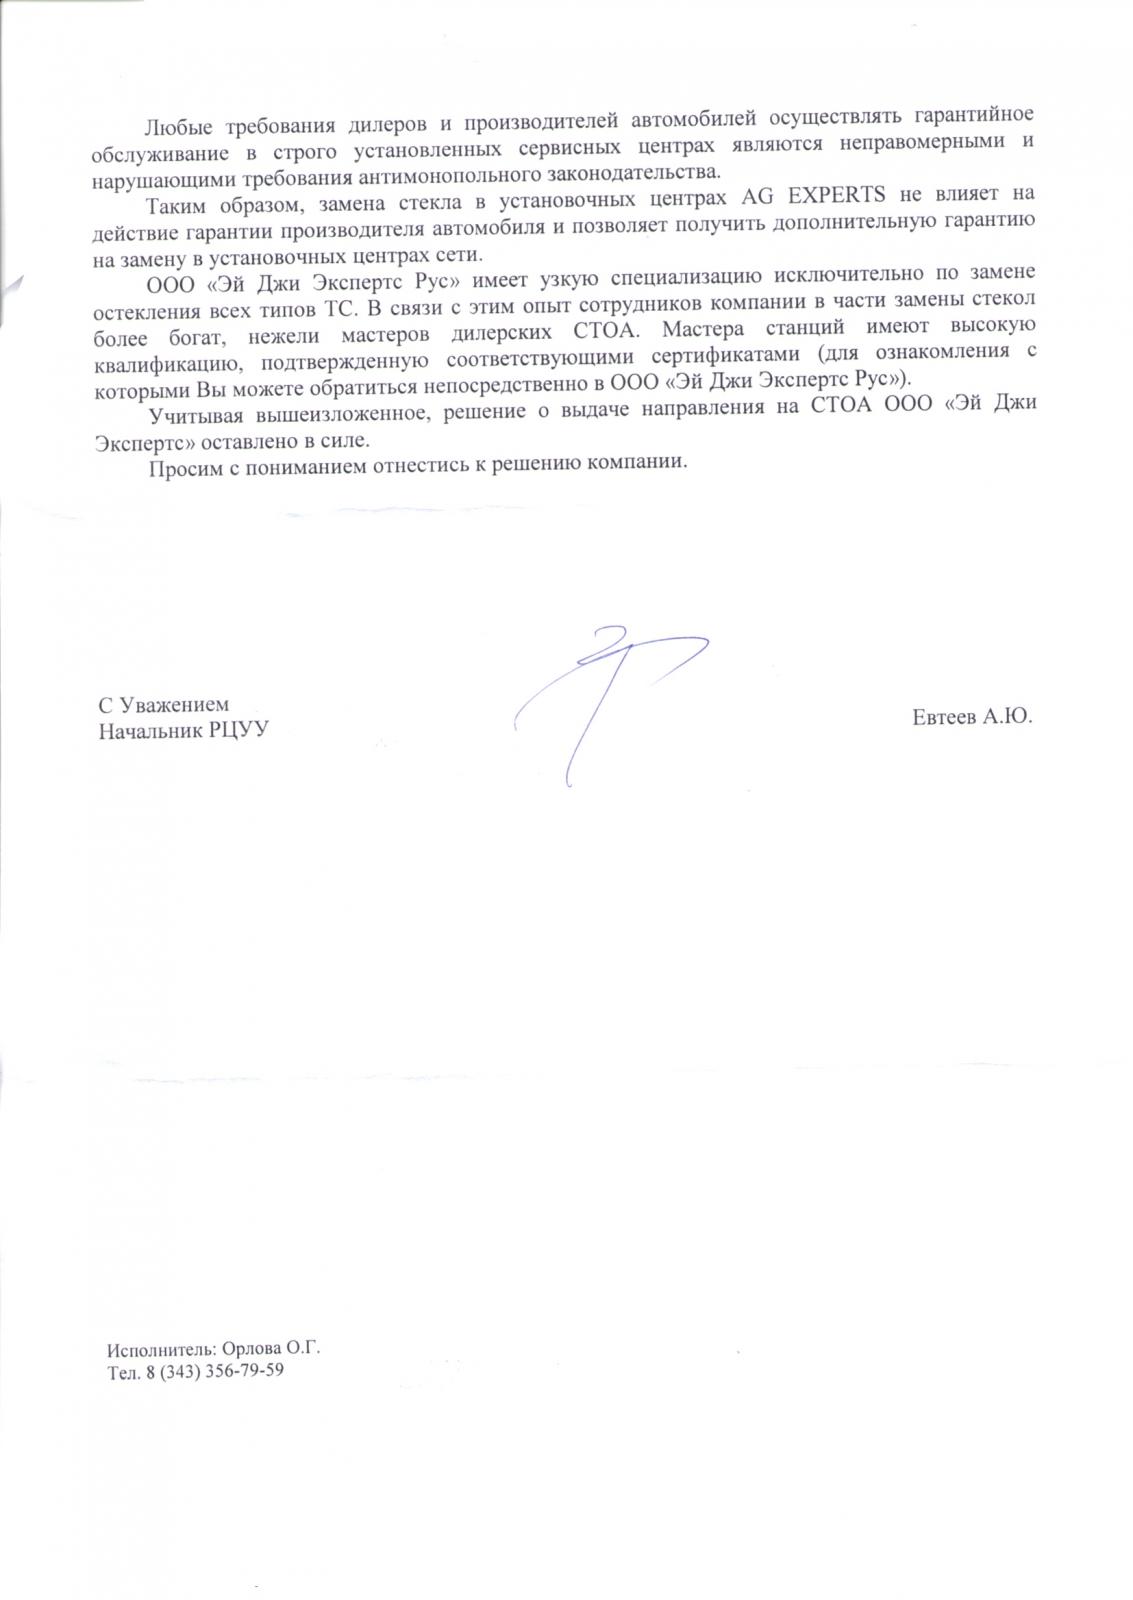 Document_499.jpg